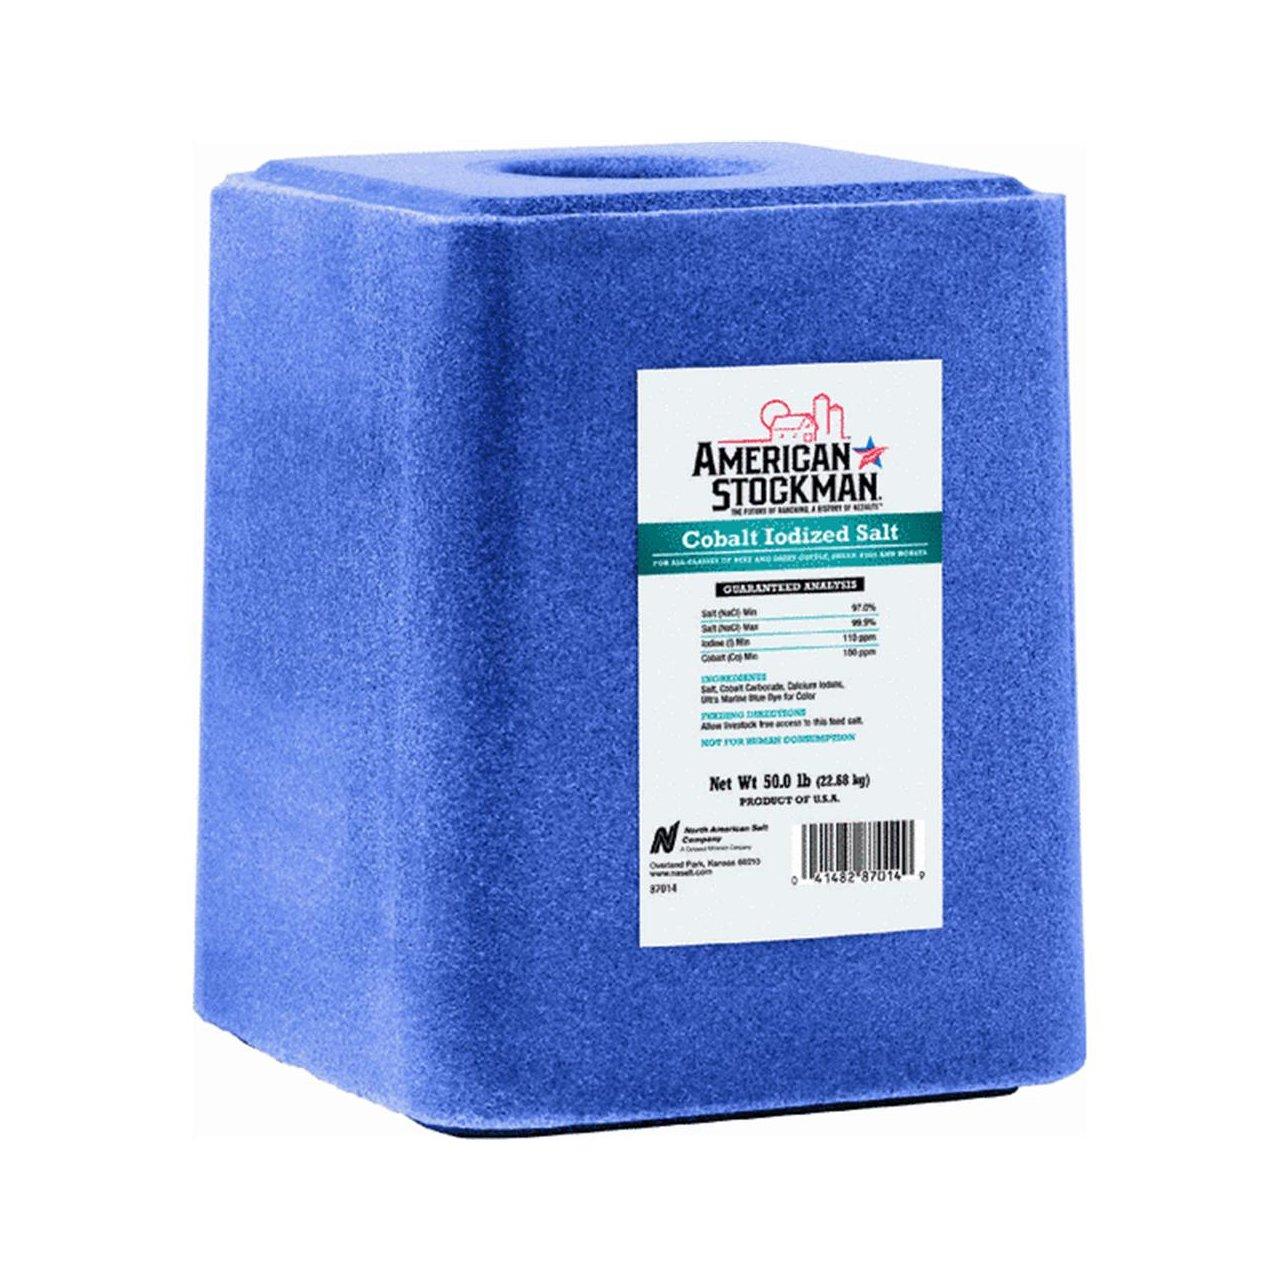 North American 87014 Cobalt Iodized Salt Block, 50 Lb